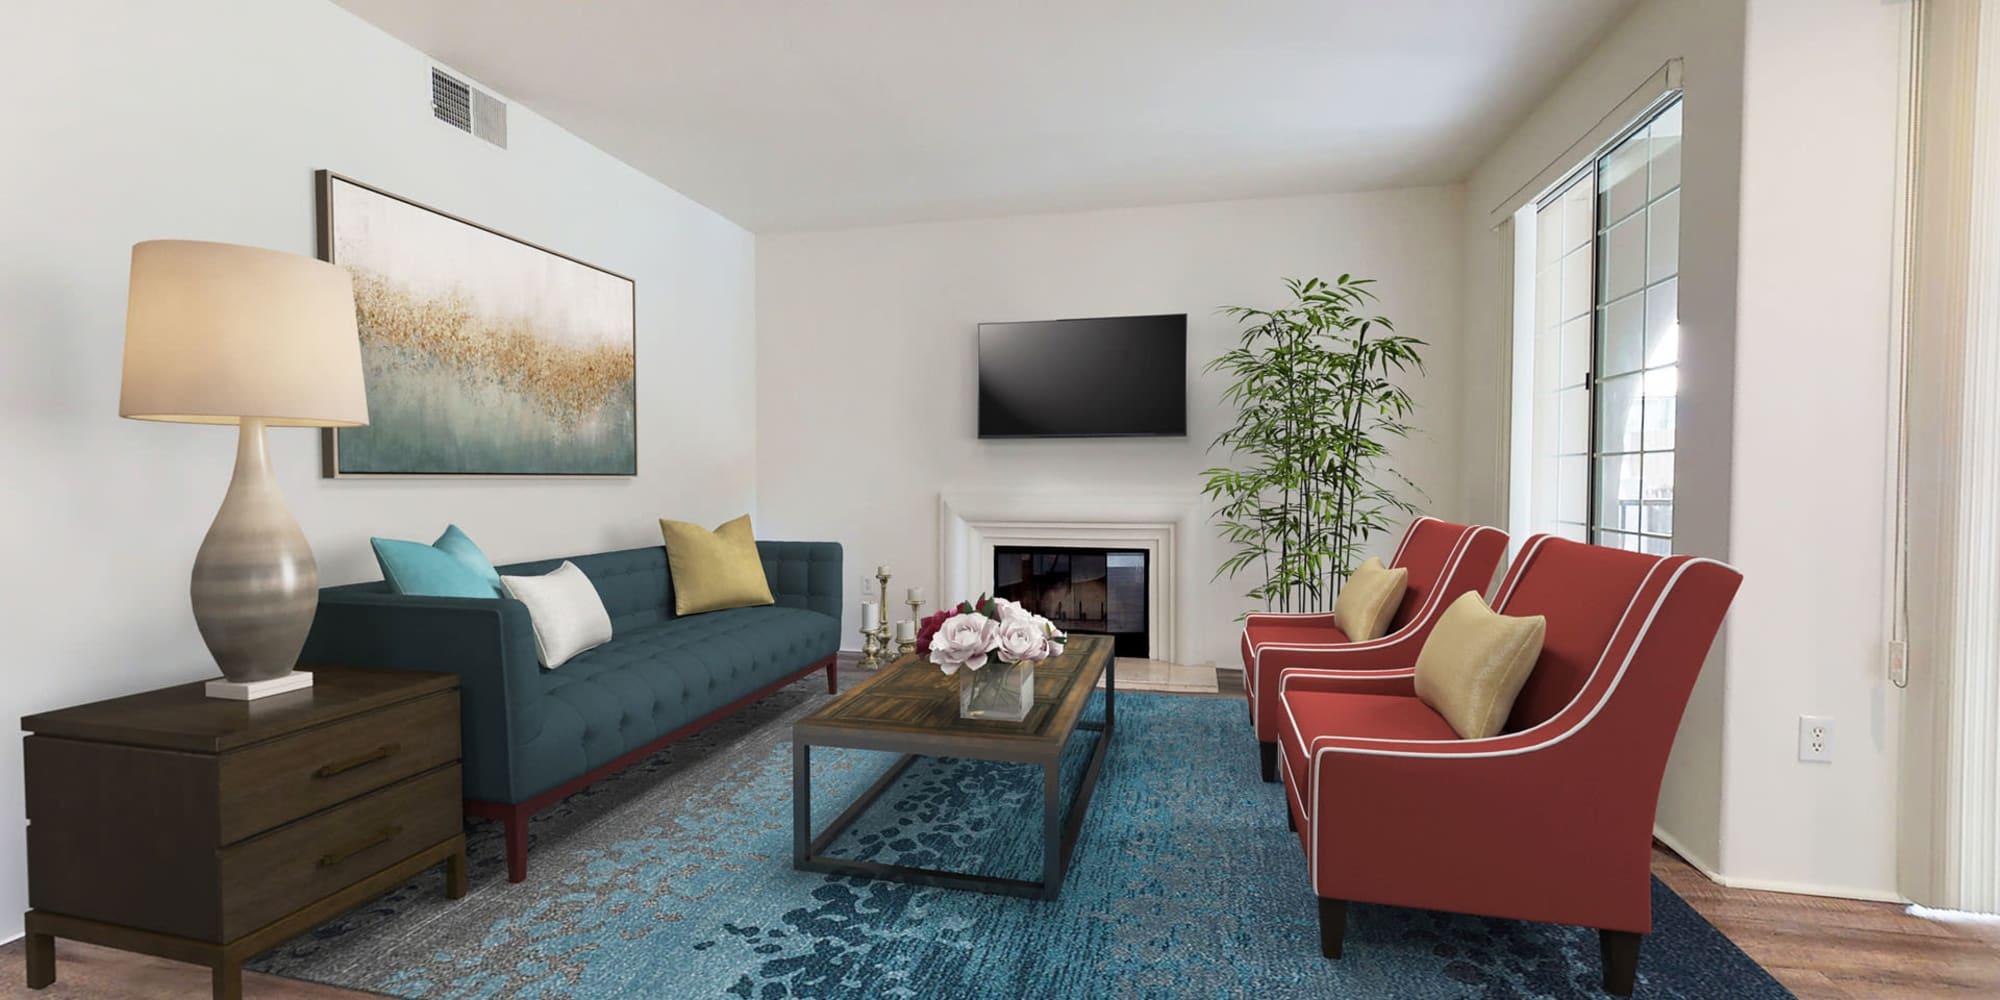 Classically furnished living area in a model home at L'Estancia in Studio City, California